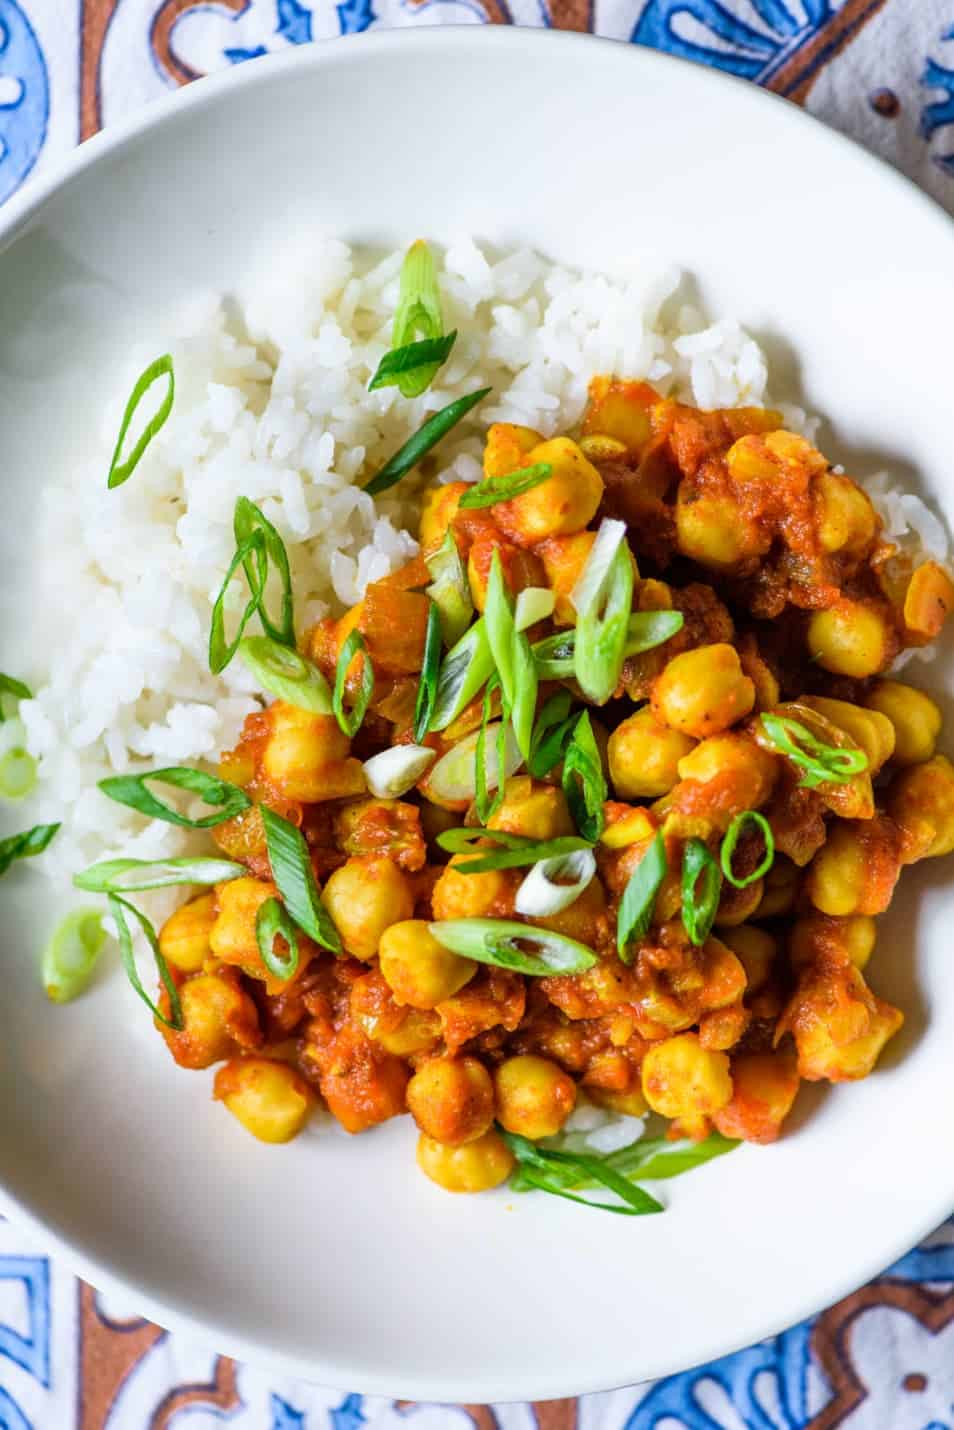 Close-up photo of bowl of chana masala with rice and scallions | Easy chana masala recipe